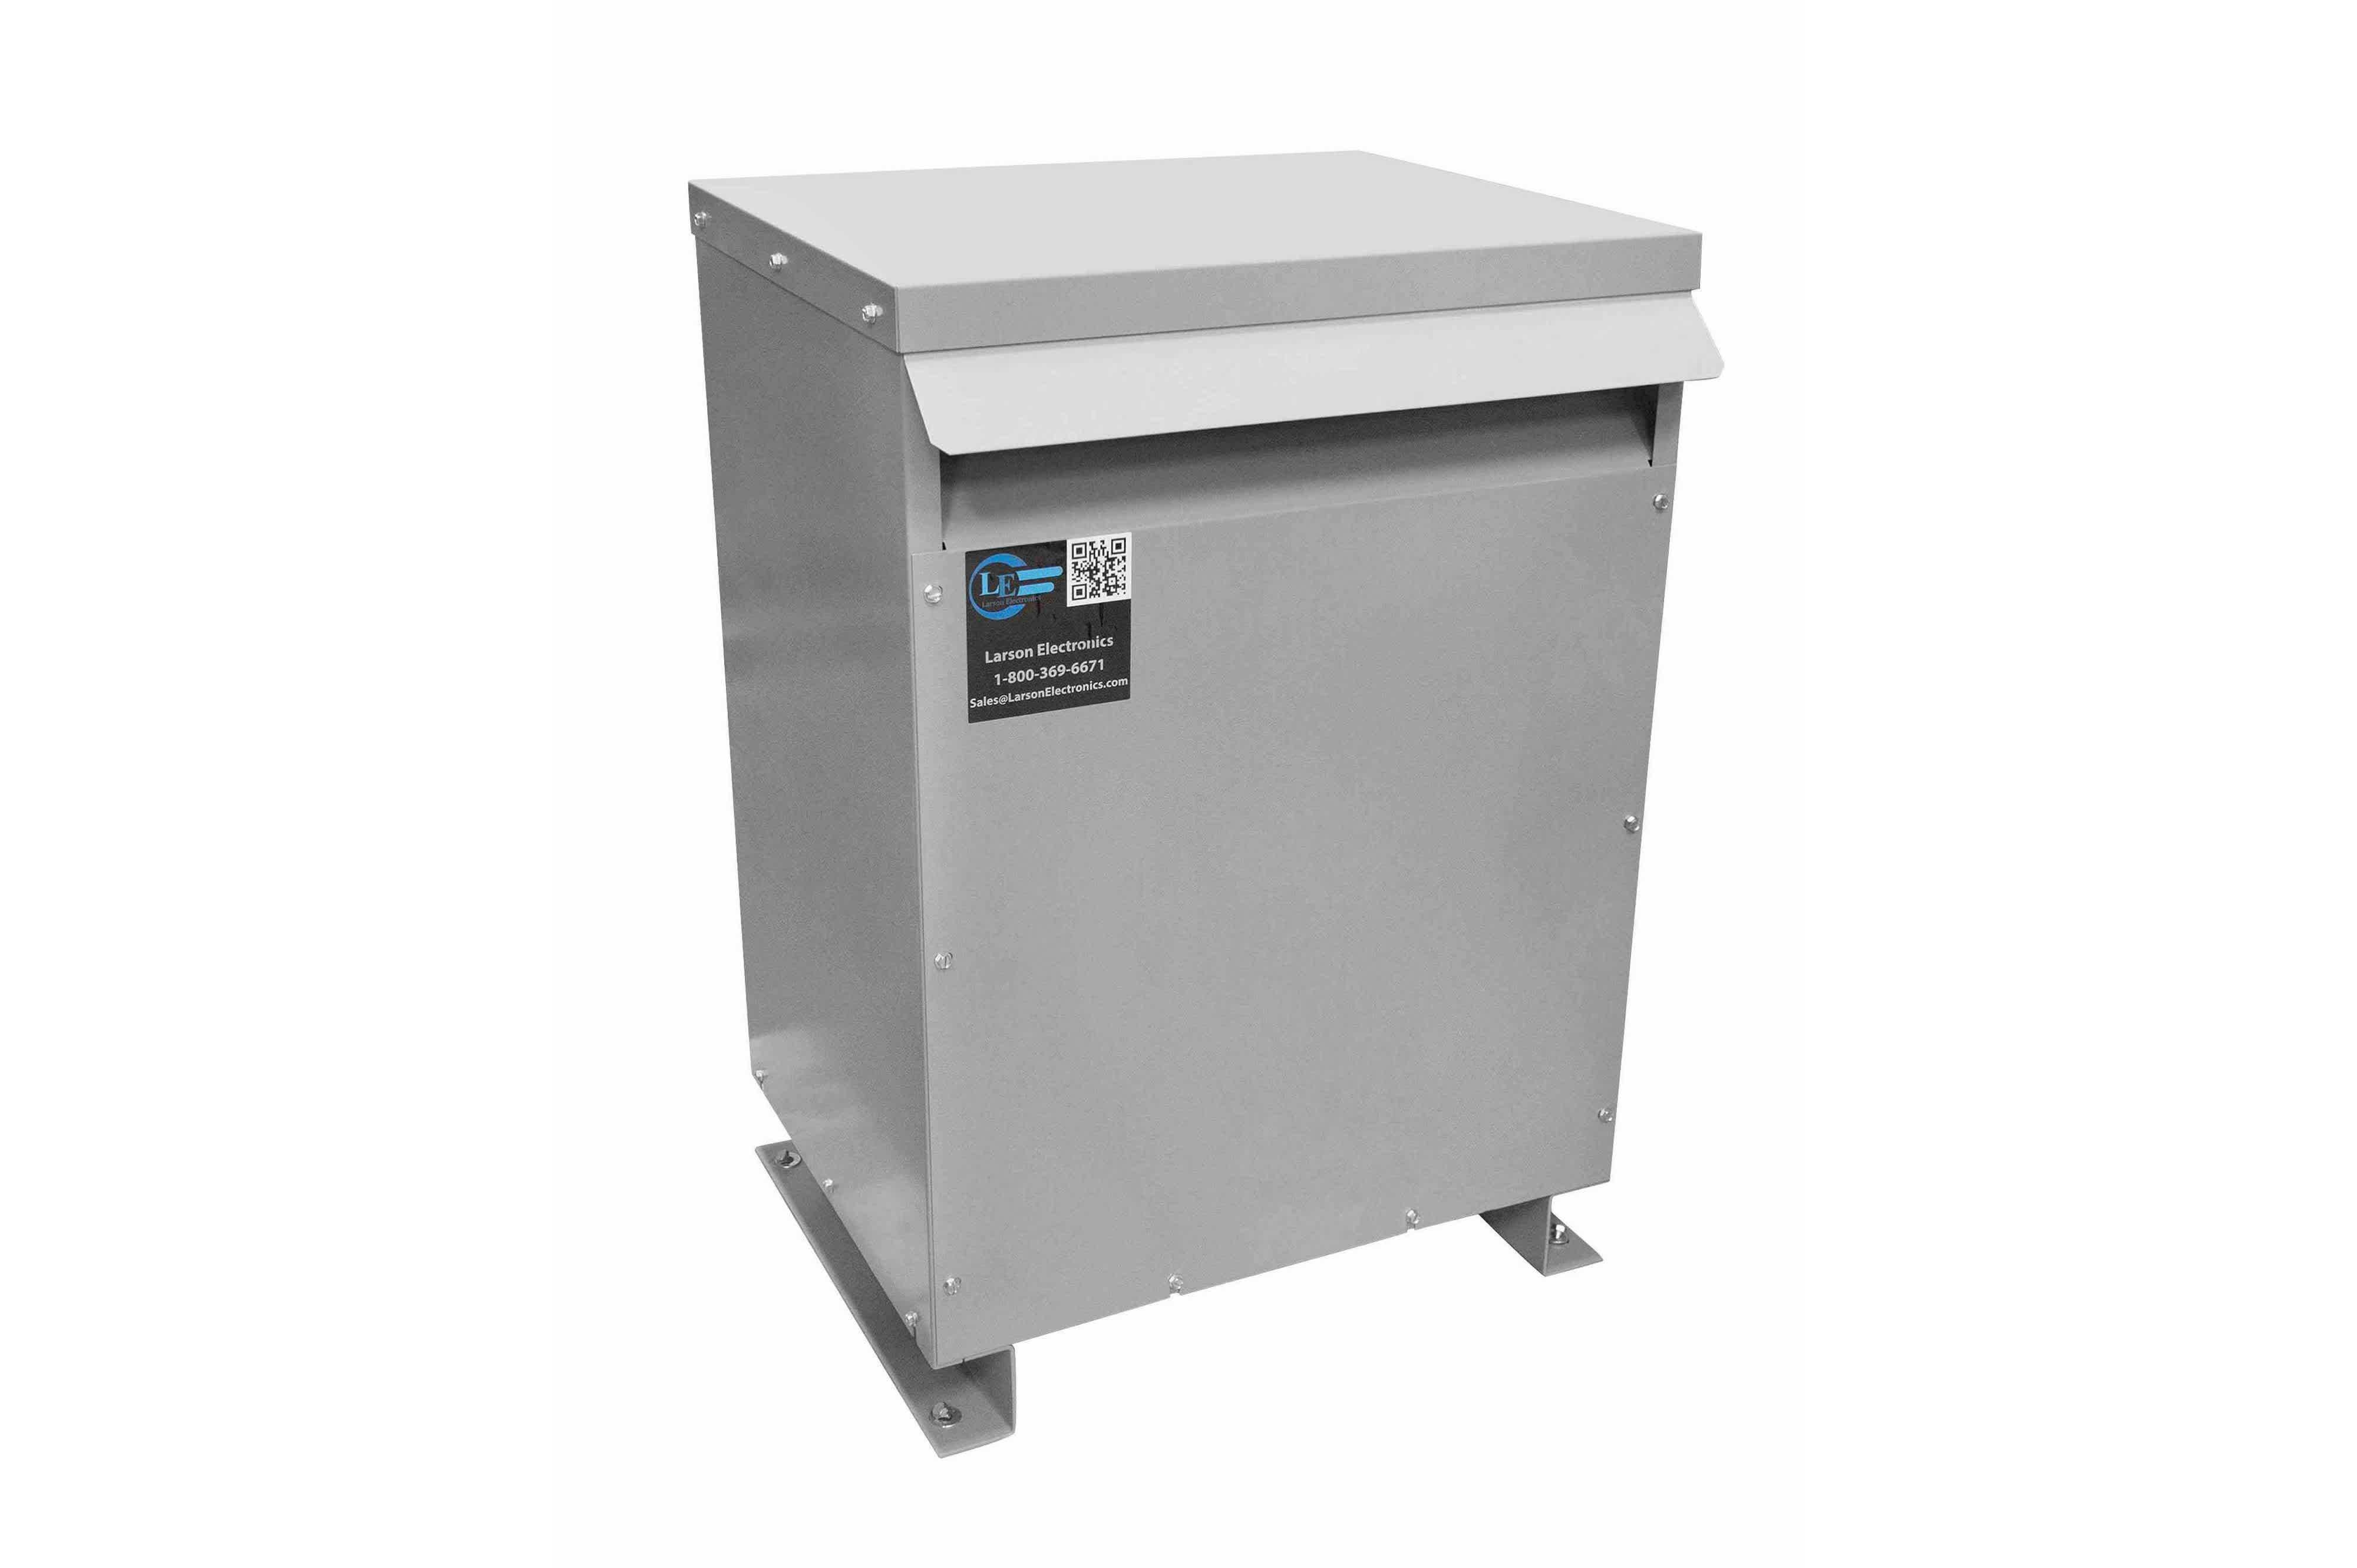 275 kVA 3PH Isolation Transformer, 240V Wye Primary, 208Y/120 Wye-N Secondary, N3R, Ventilated, 60 Hz